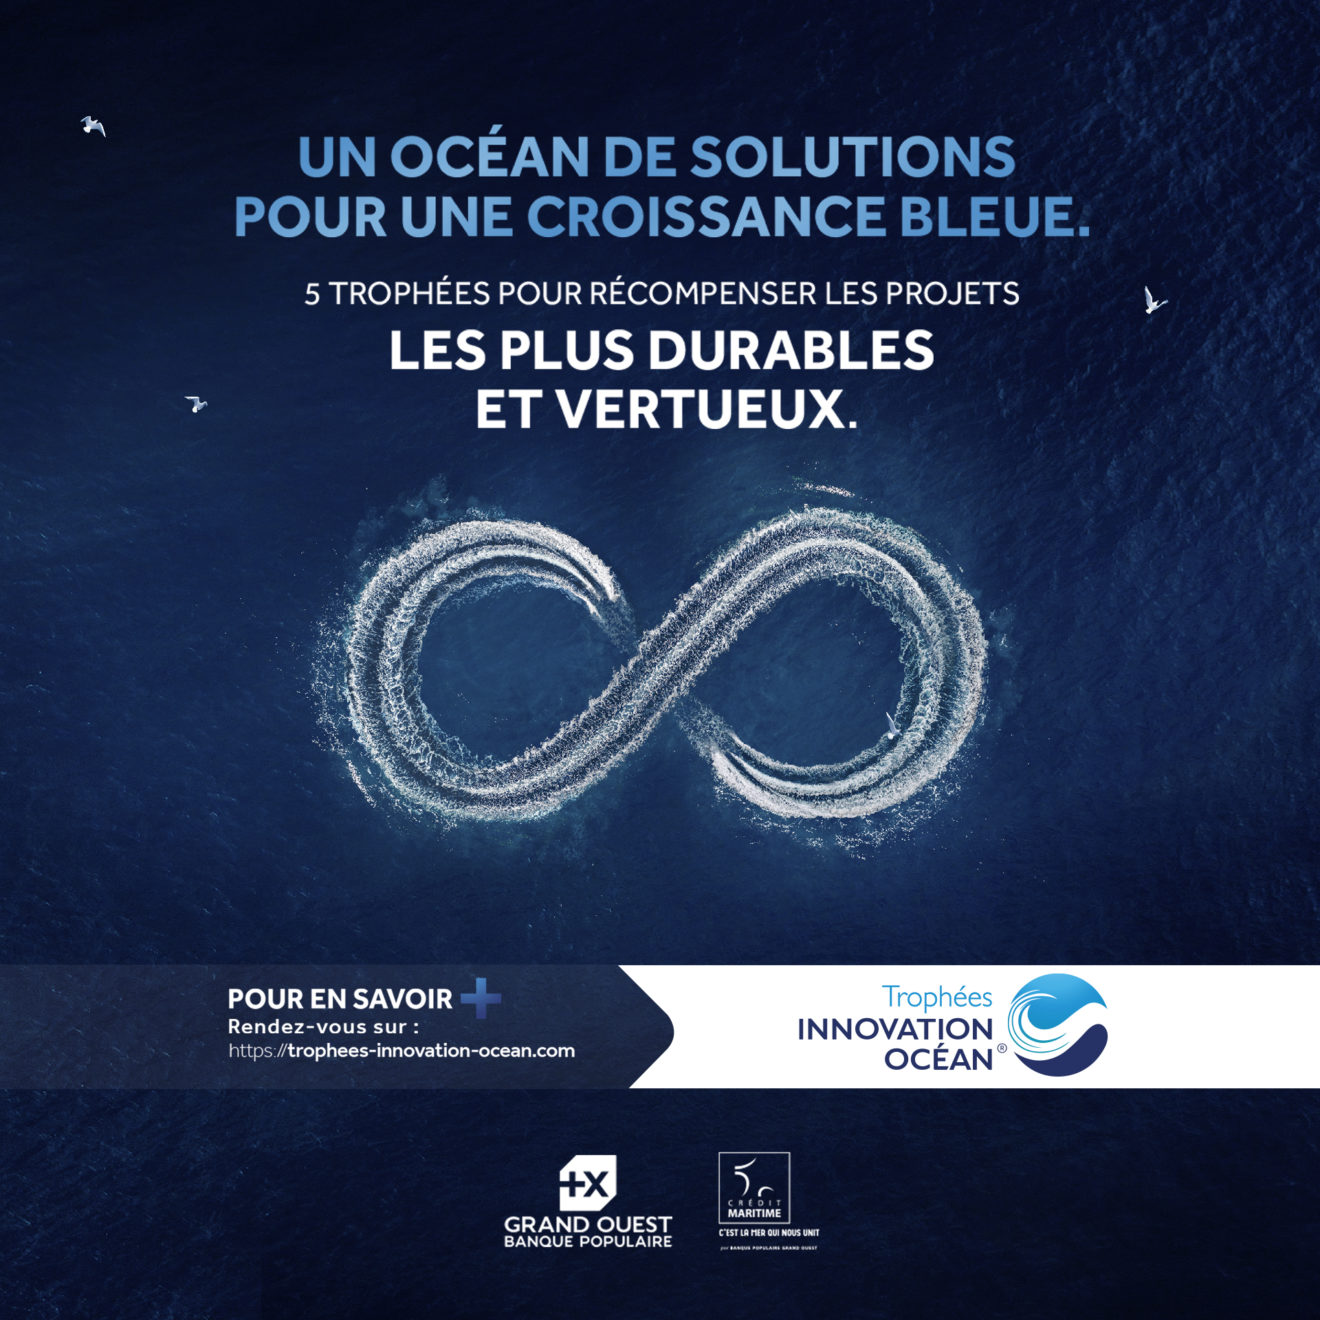 Trophees innovation ocean Affichage_Carré+